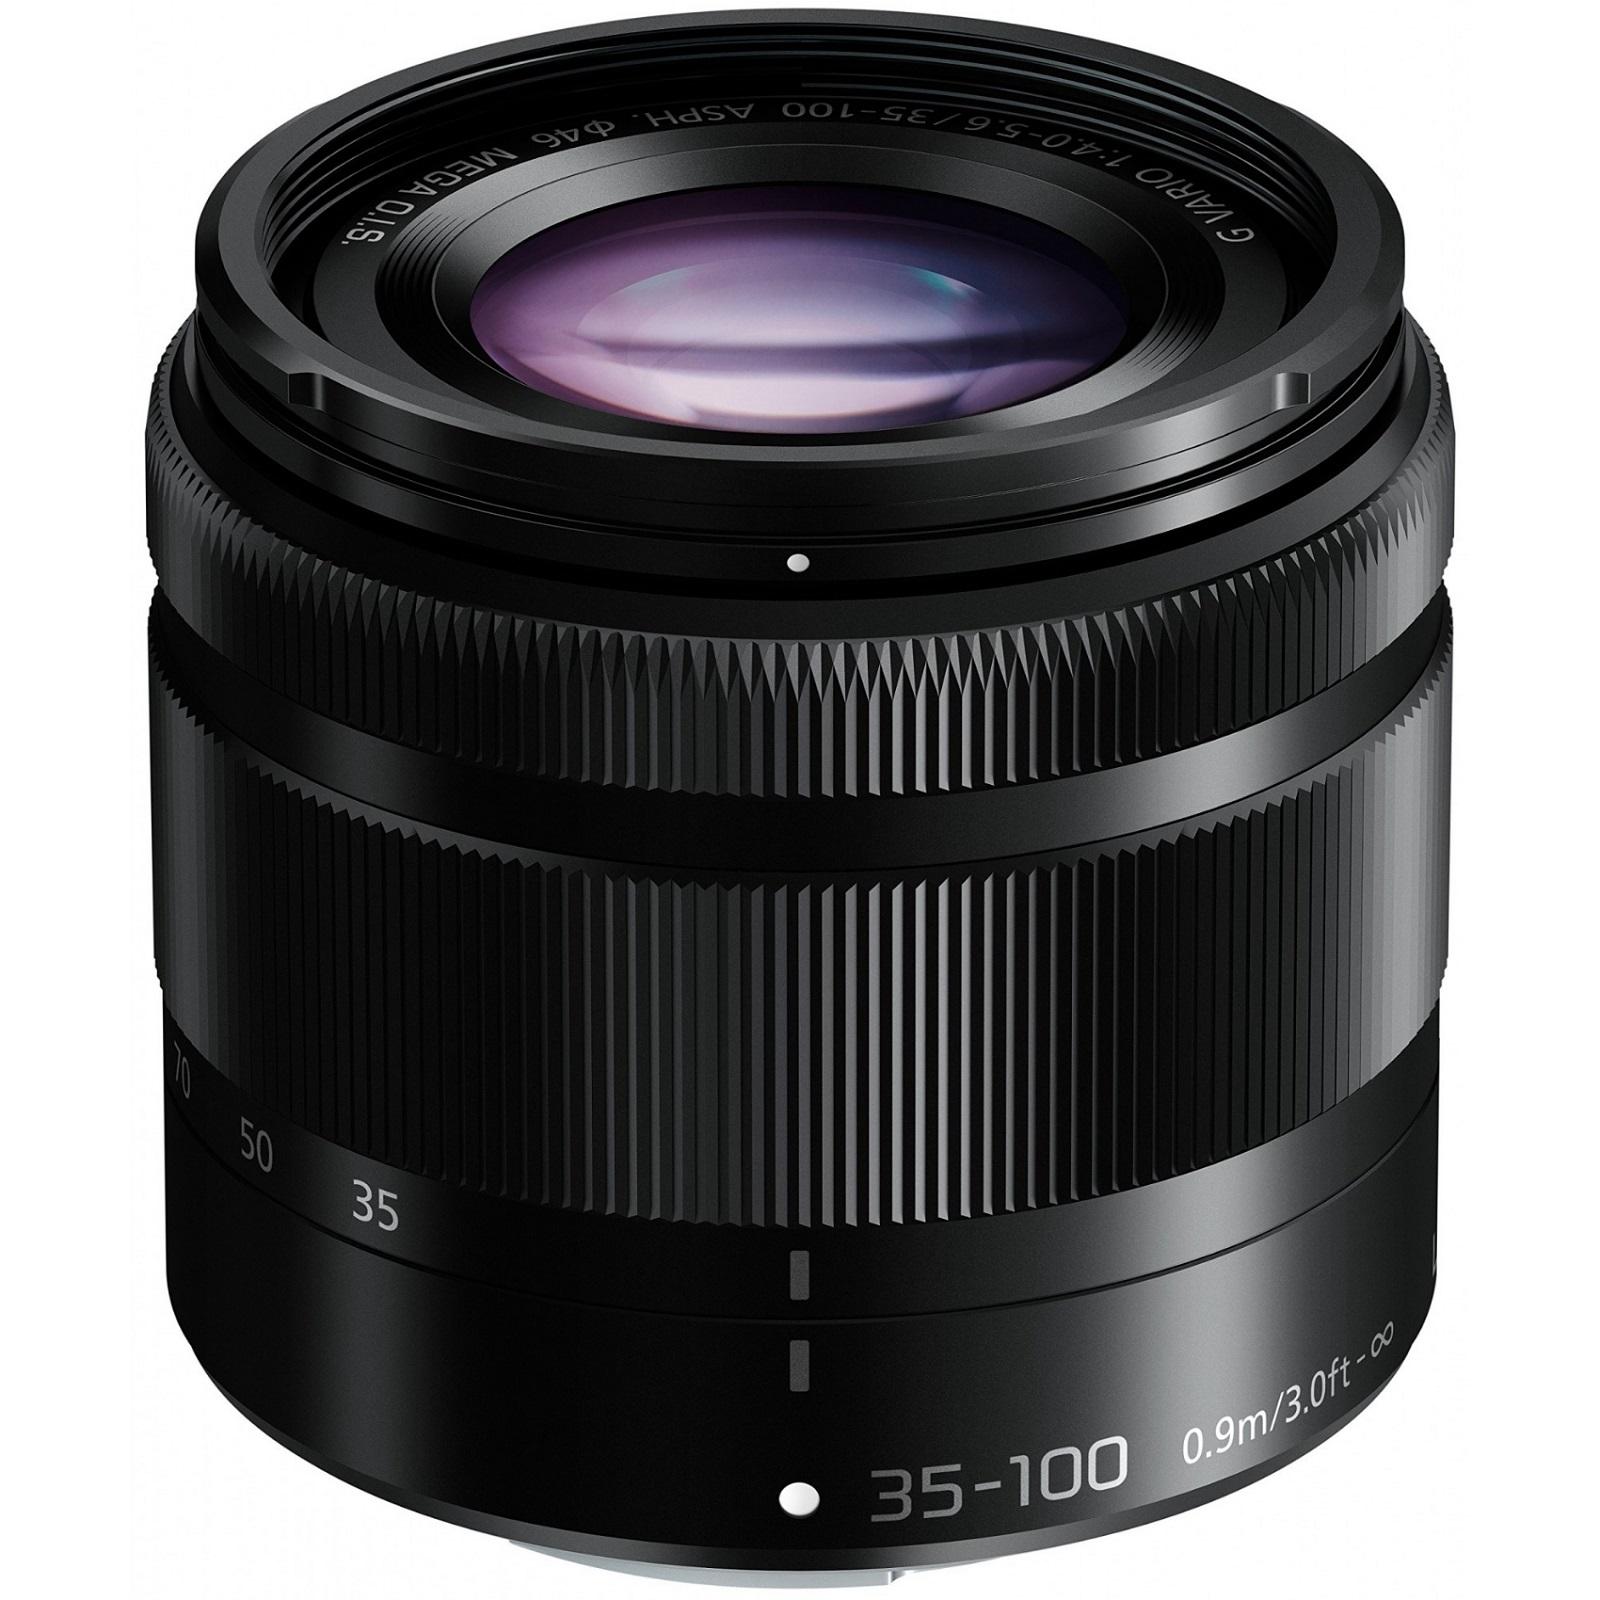 Panasonic パナソニック ルミックス G VARIO 35-100mm F4.0-5.6 ASPH./MEGA O.I.S. ブラック 新品 (簡易箱)